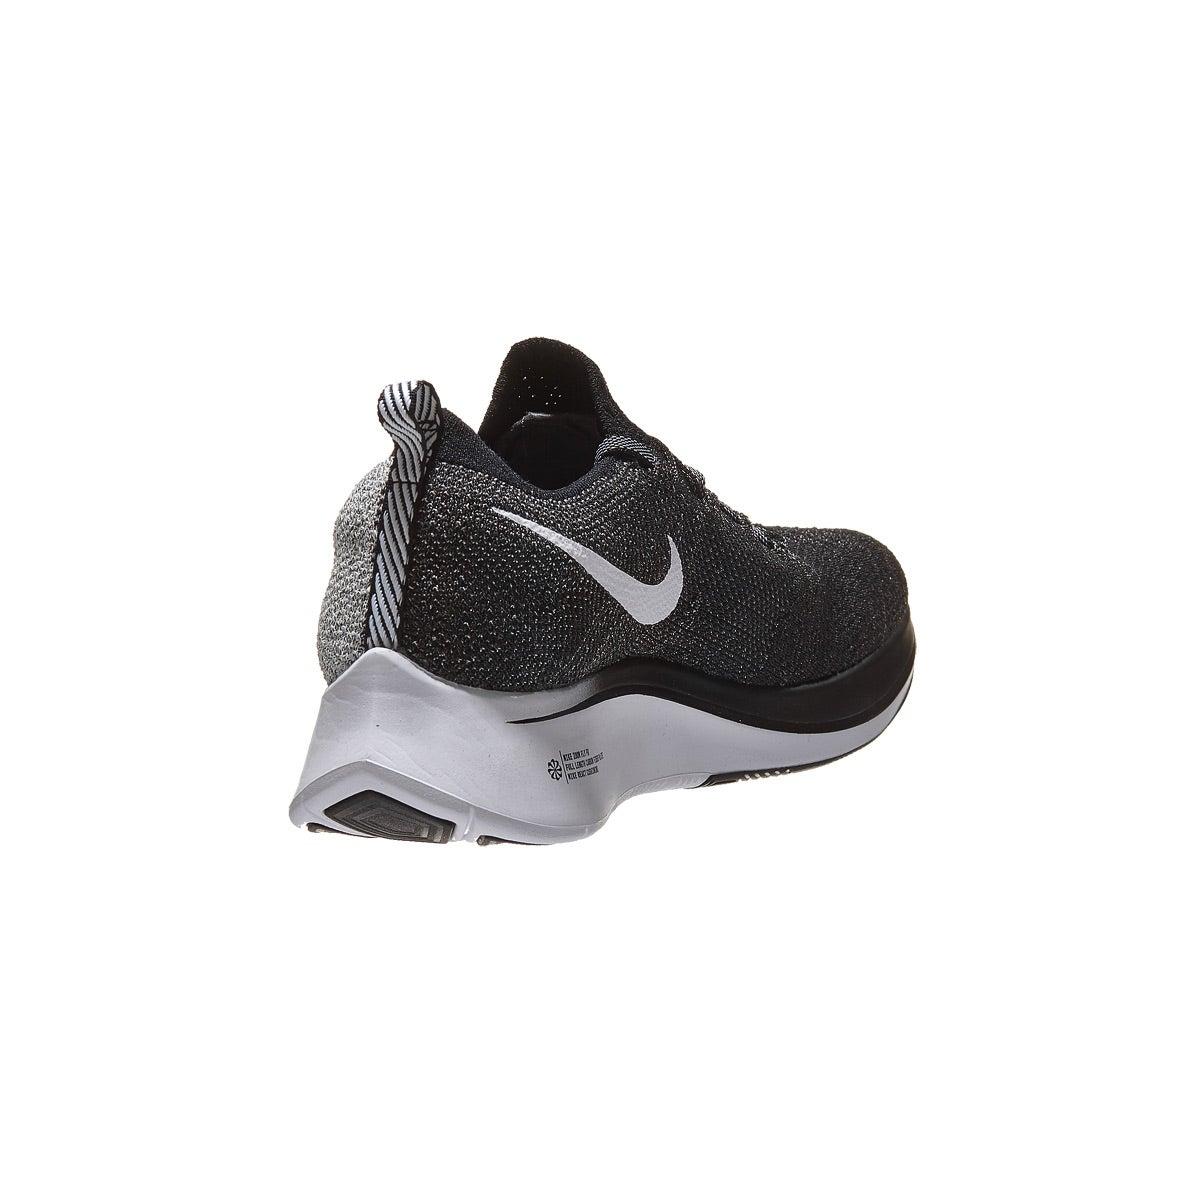 bb99ff2d74a9 Nike Zoom Fly OG Flyknit Men s Shoes Black Black White 360° View ...